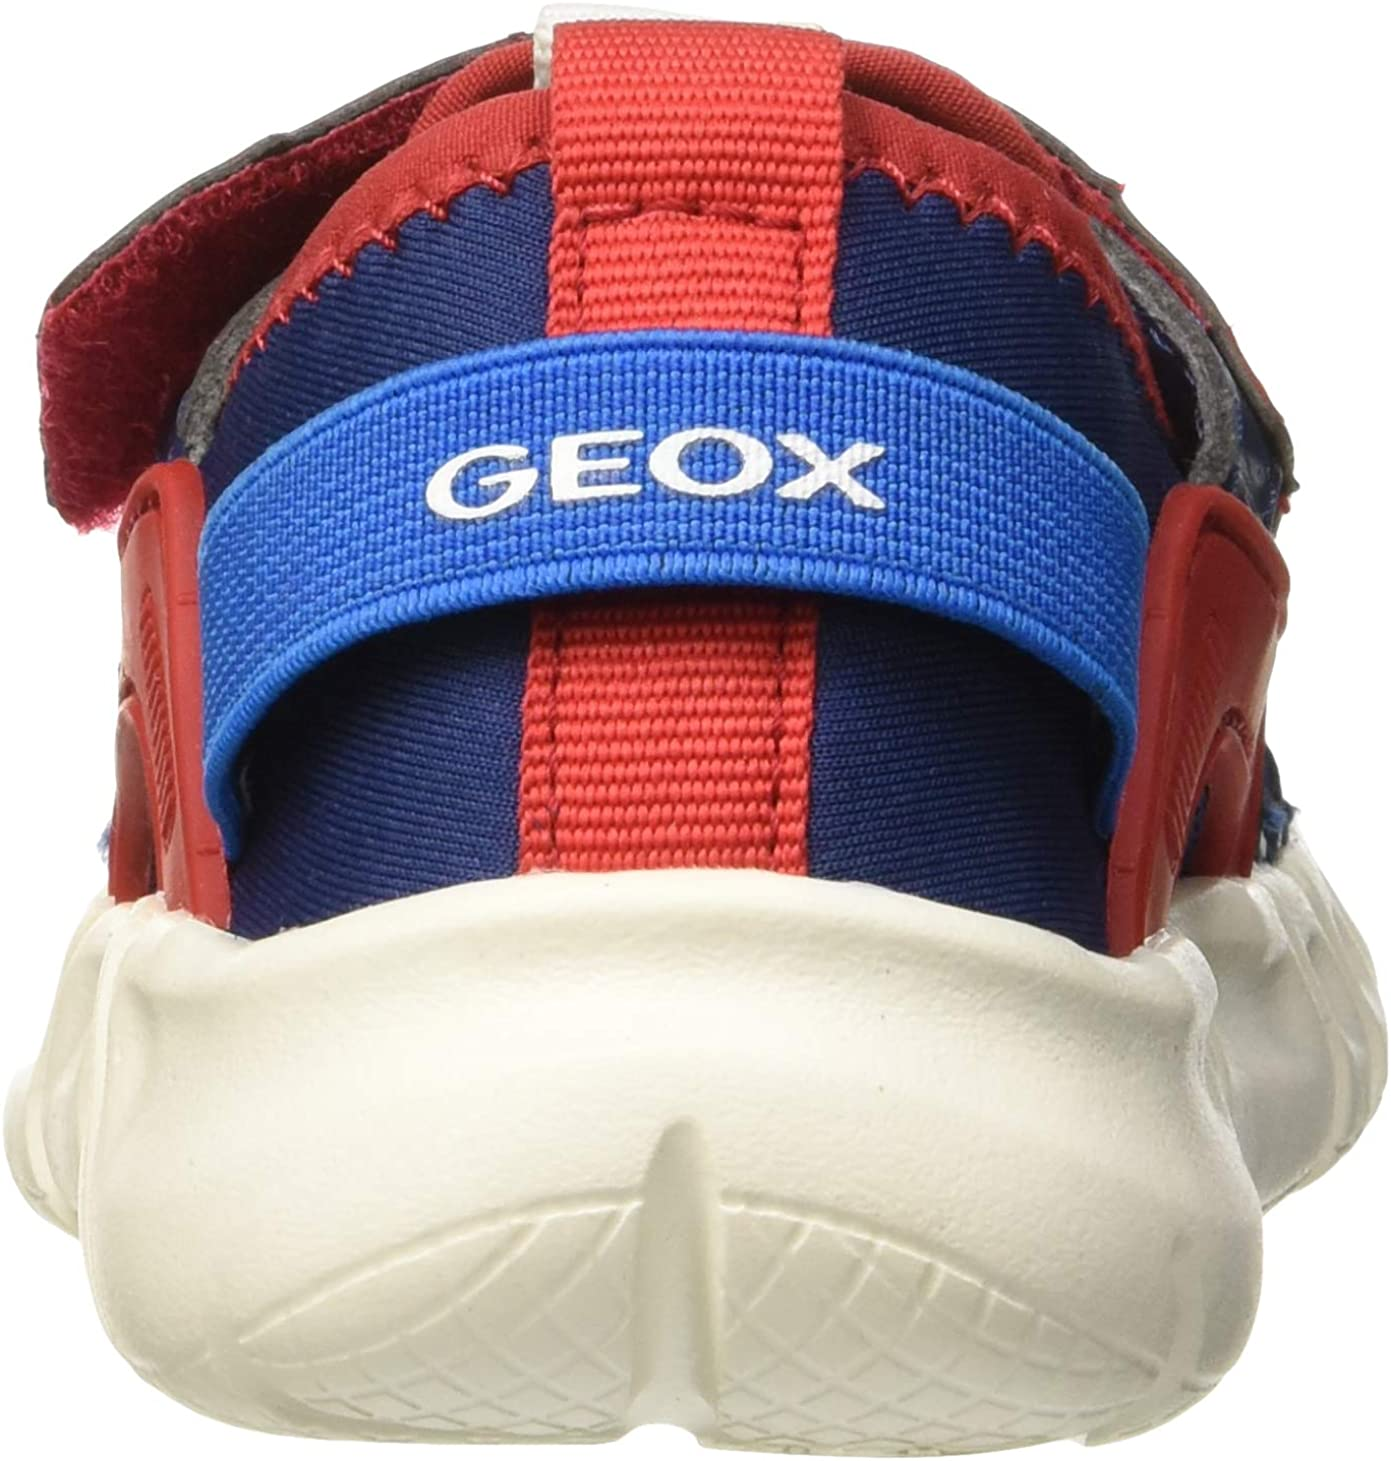 Geox Baby Boys B Flexyper D Low-Top Sneakers